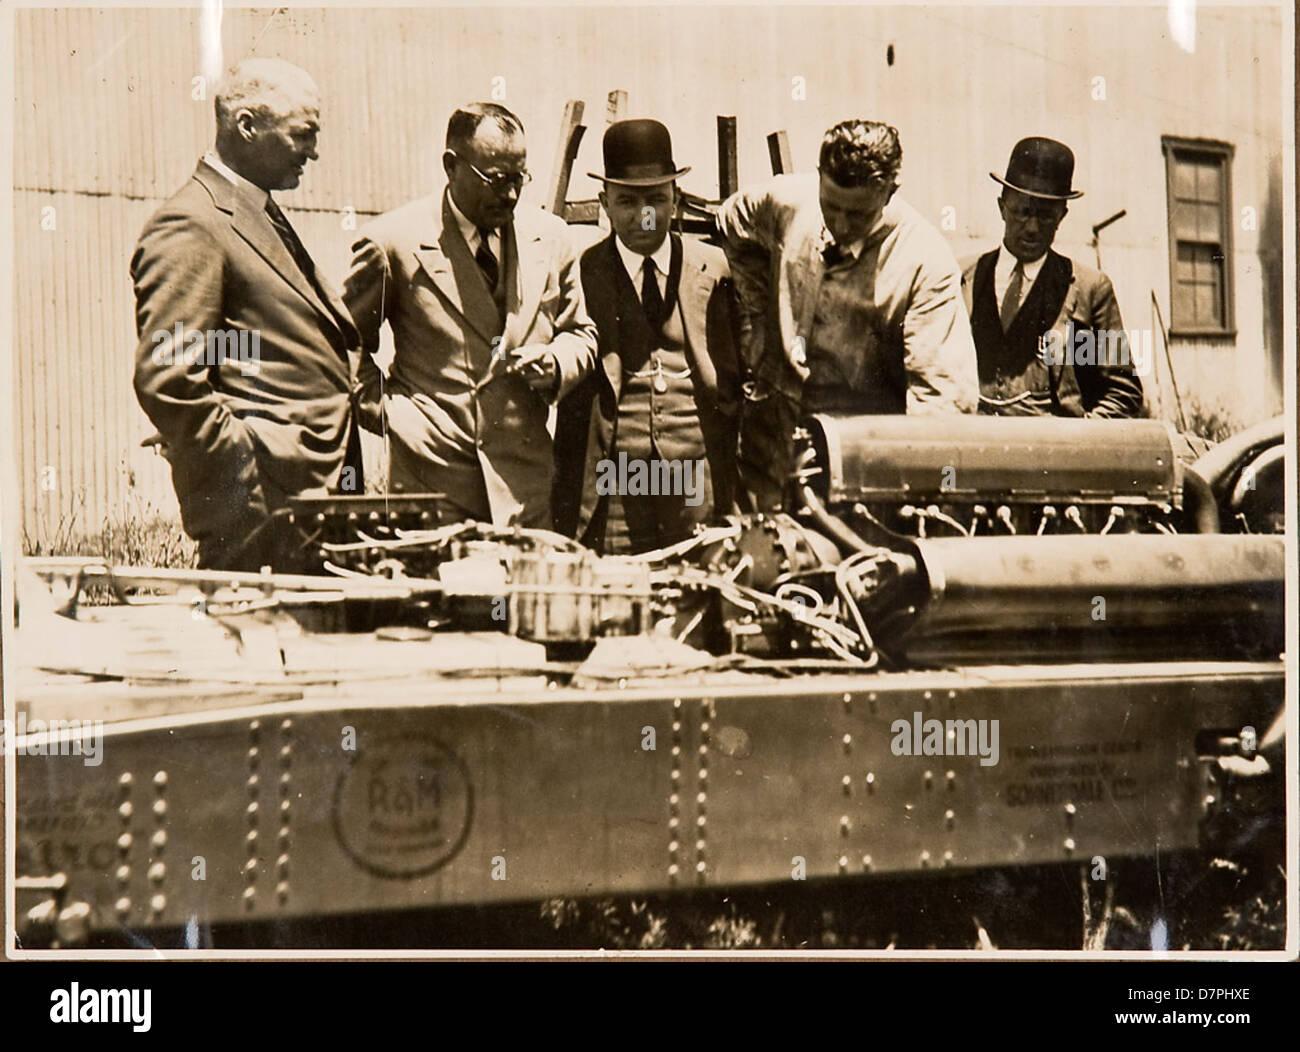 Men inspecting the car 'F.H. Stewart Enterprise', 1926 - 1936 - Stock Image